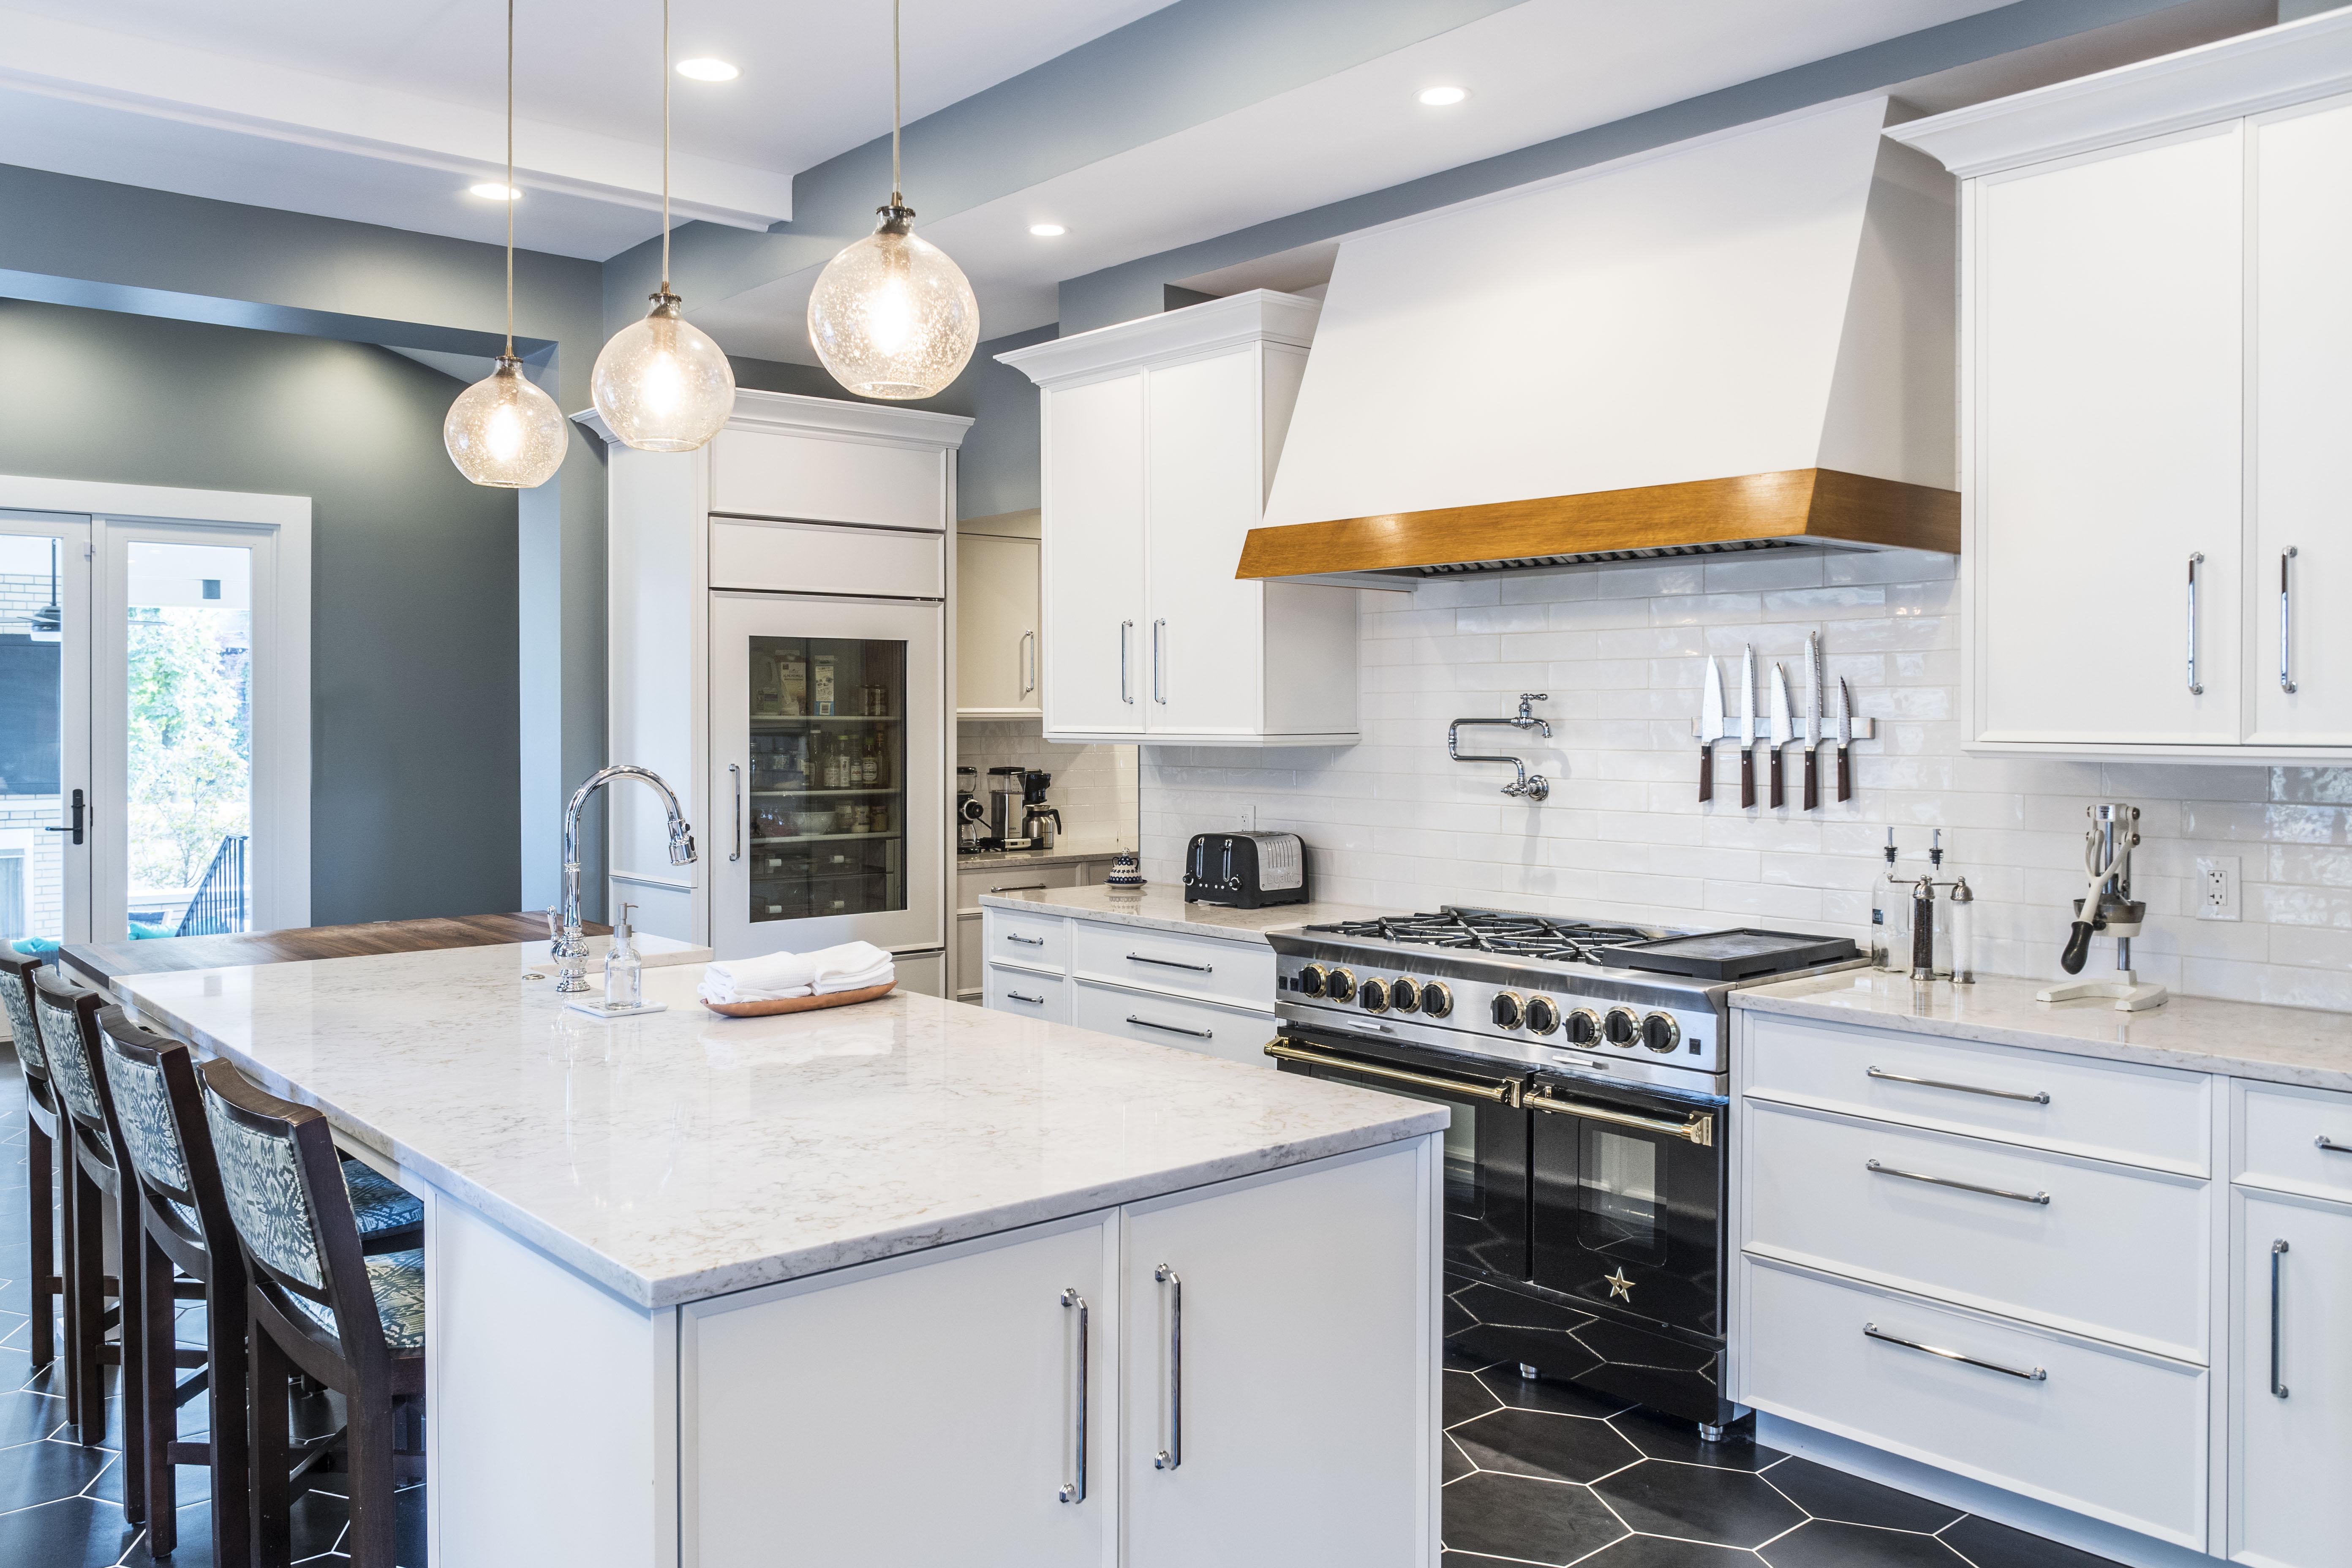 203 - Rob Klein + Amy Kreutz: Kitchen Design Off - The Chaise Lounge ...